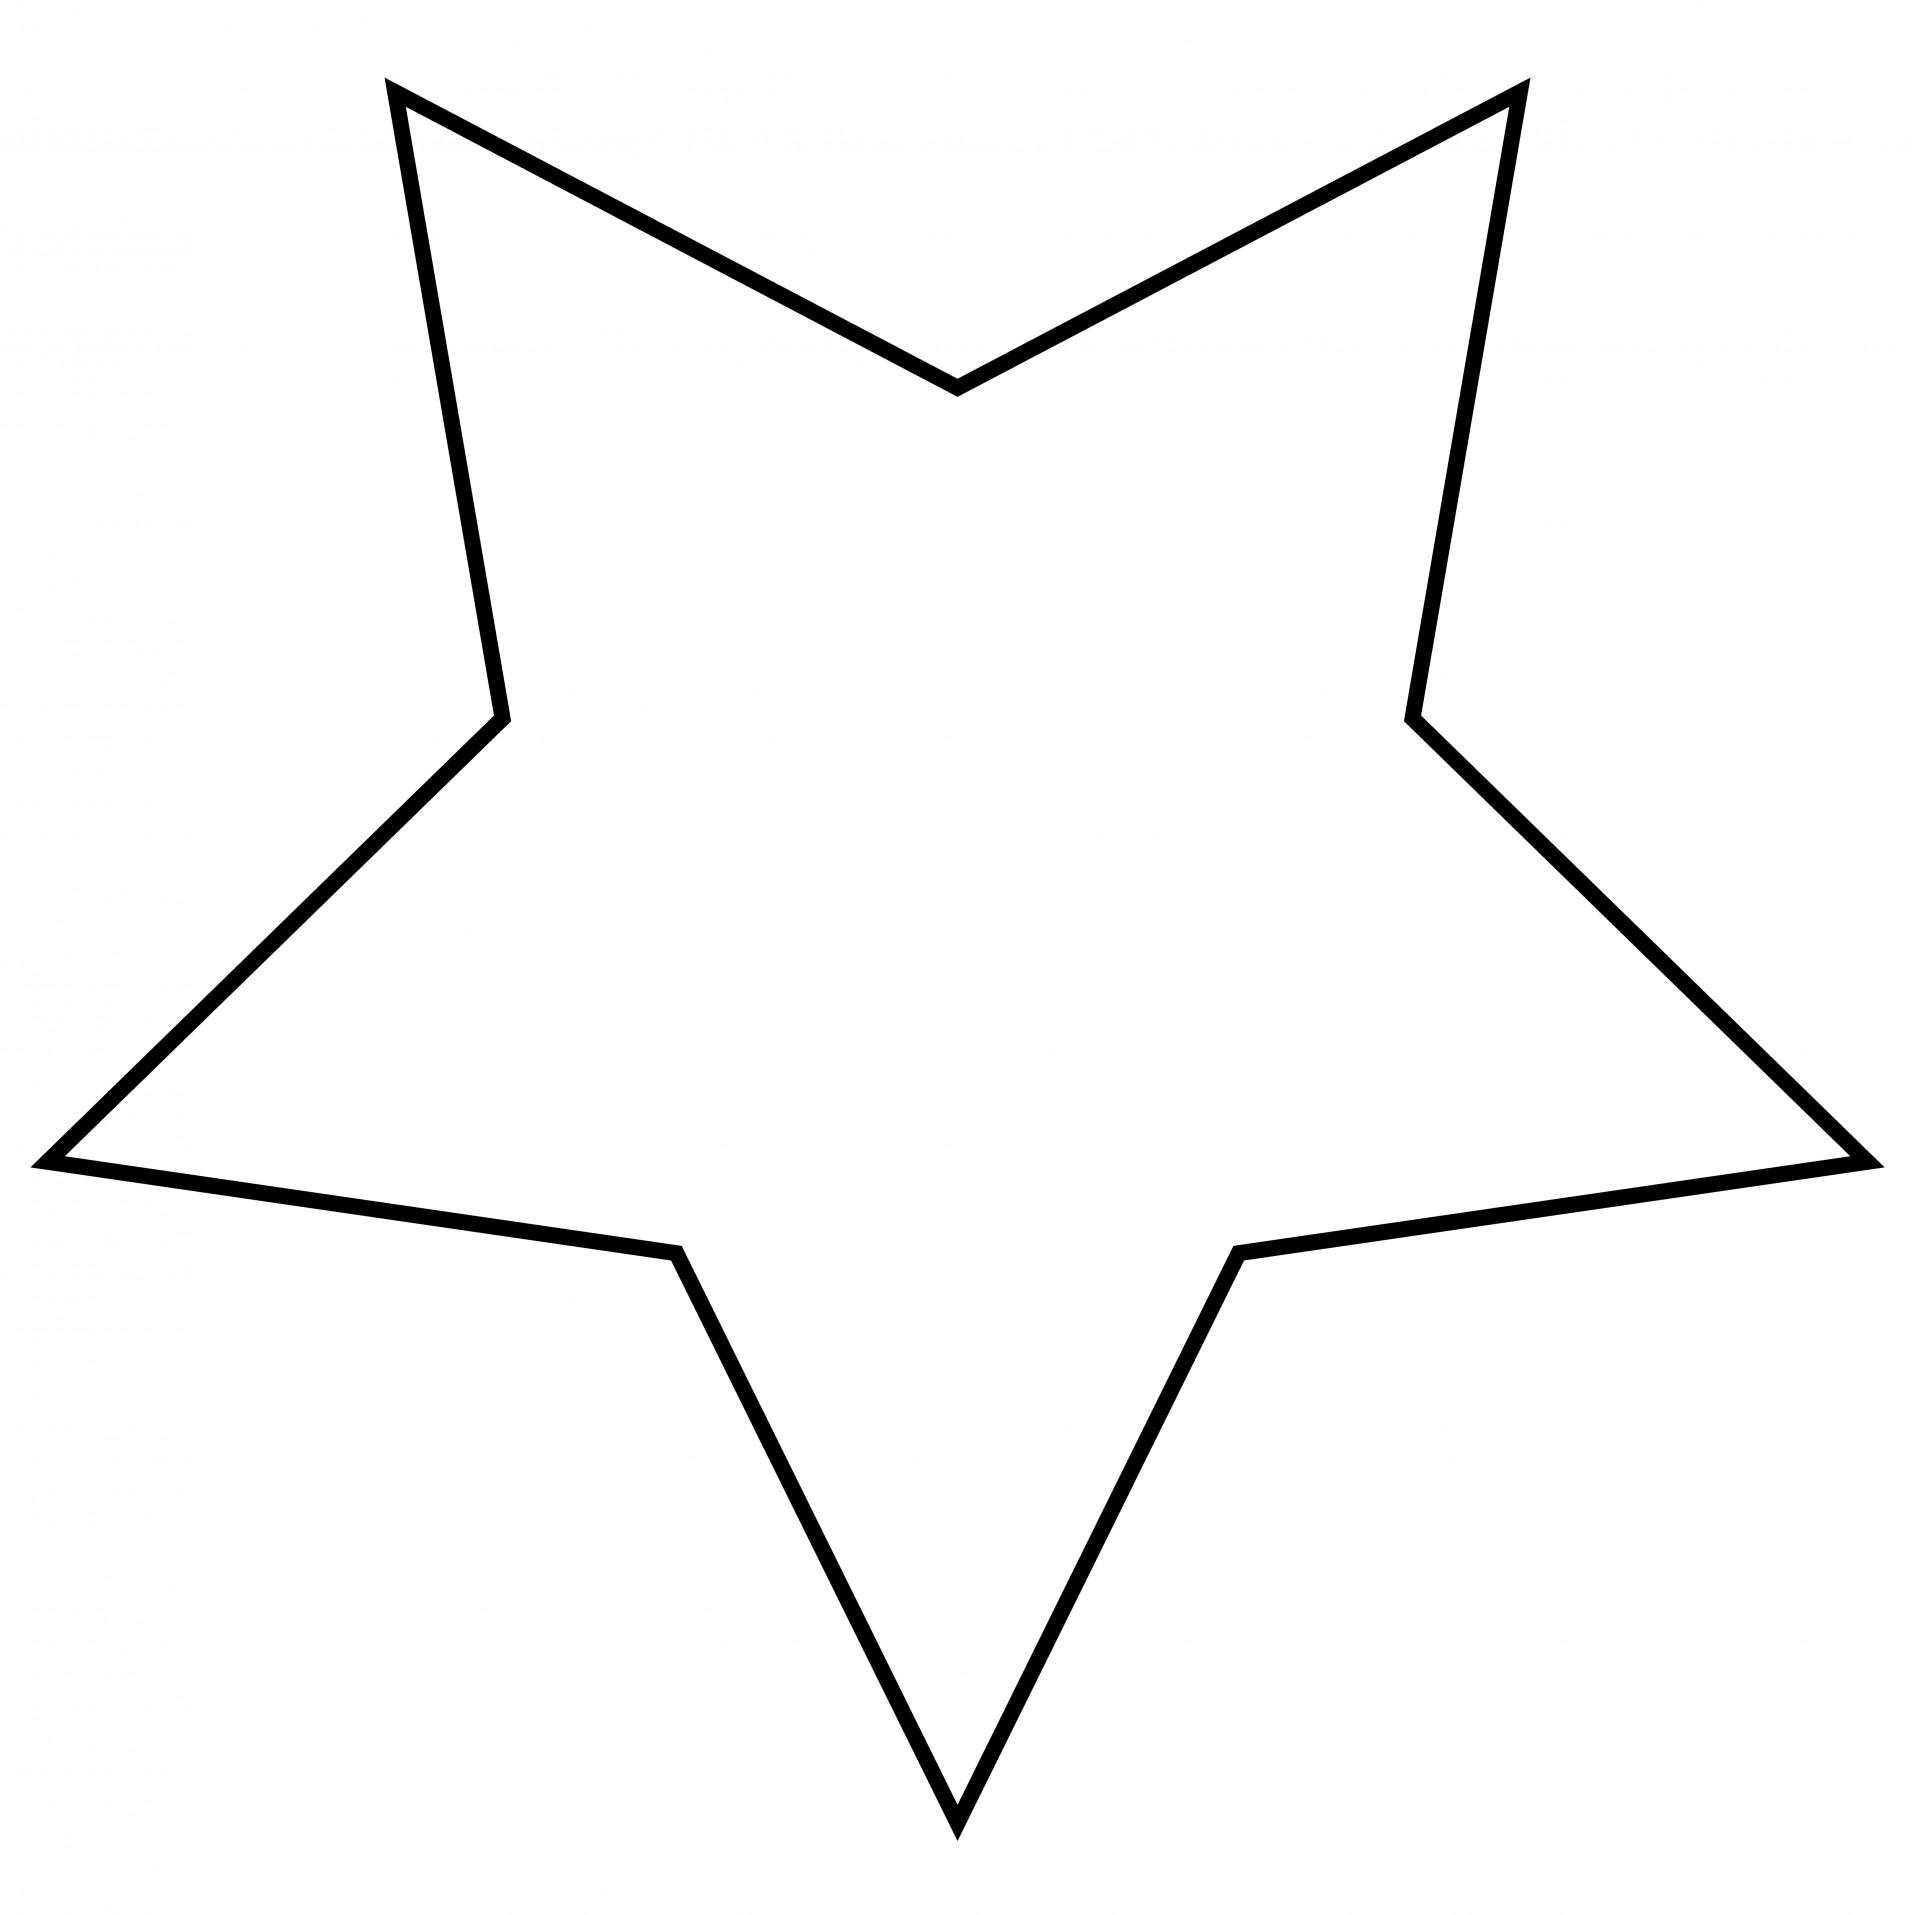 Star Outline Clipart-Star Outline Clipart-18